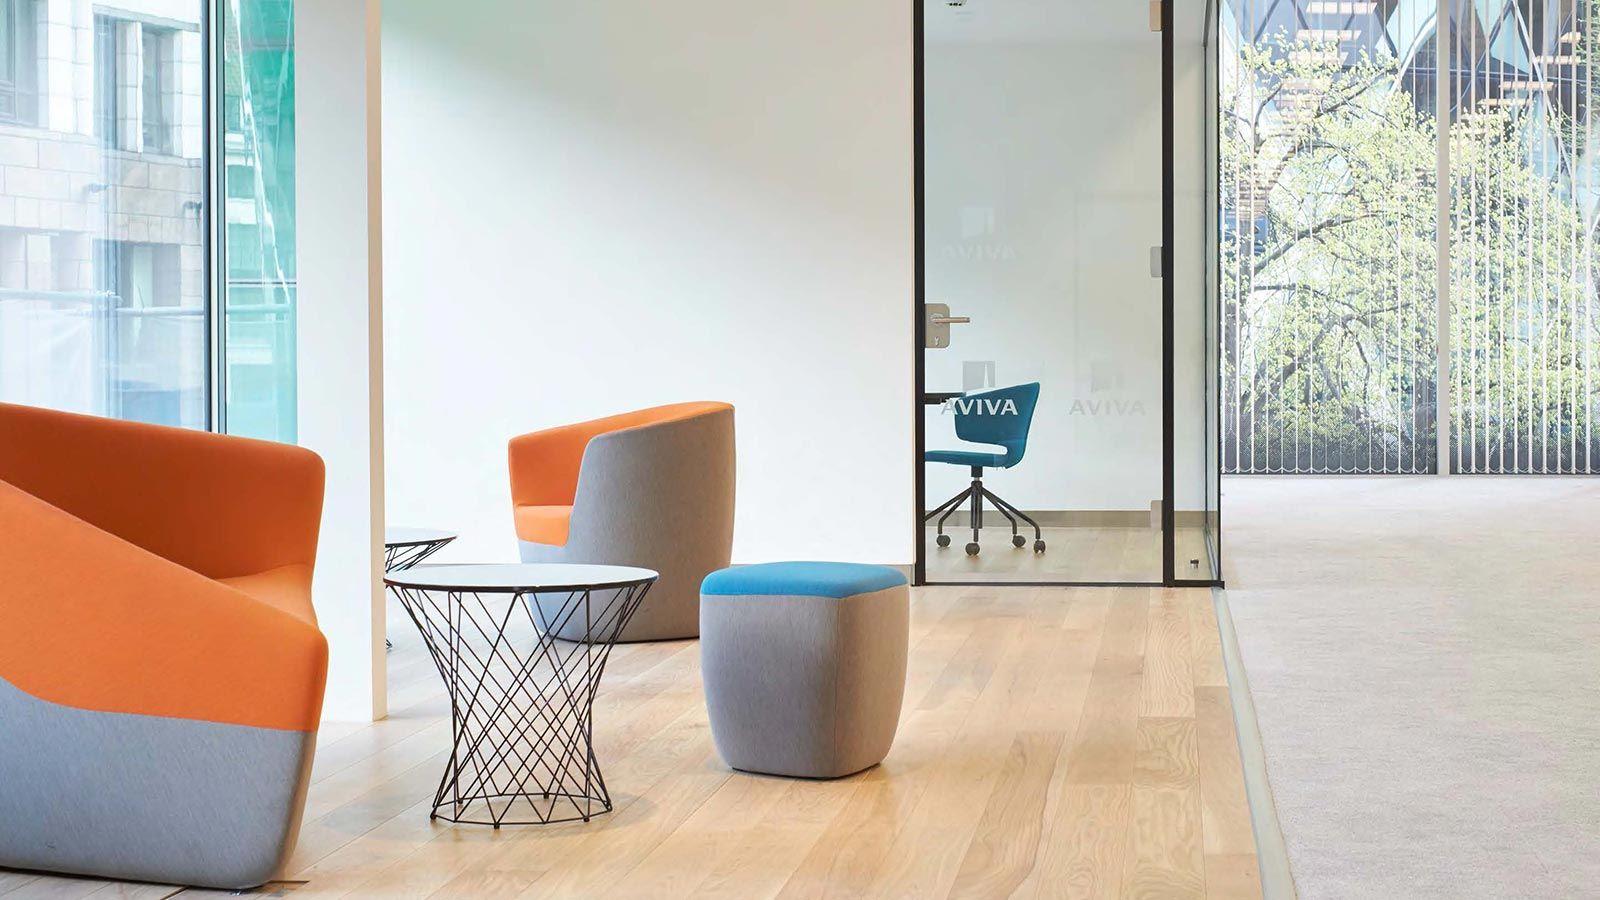 Aviva Building Interior - Mace Group